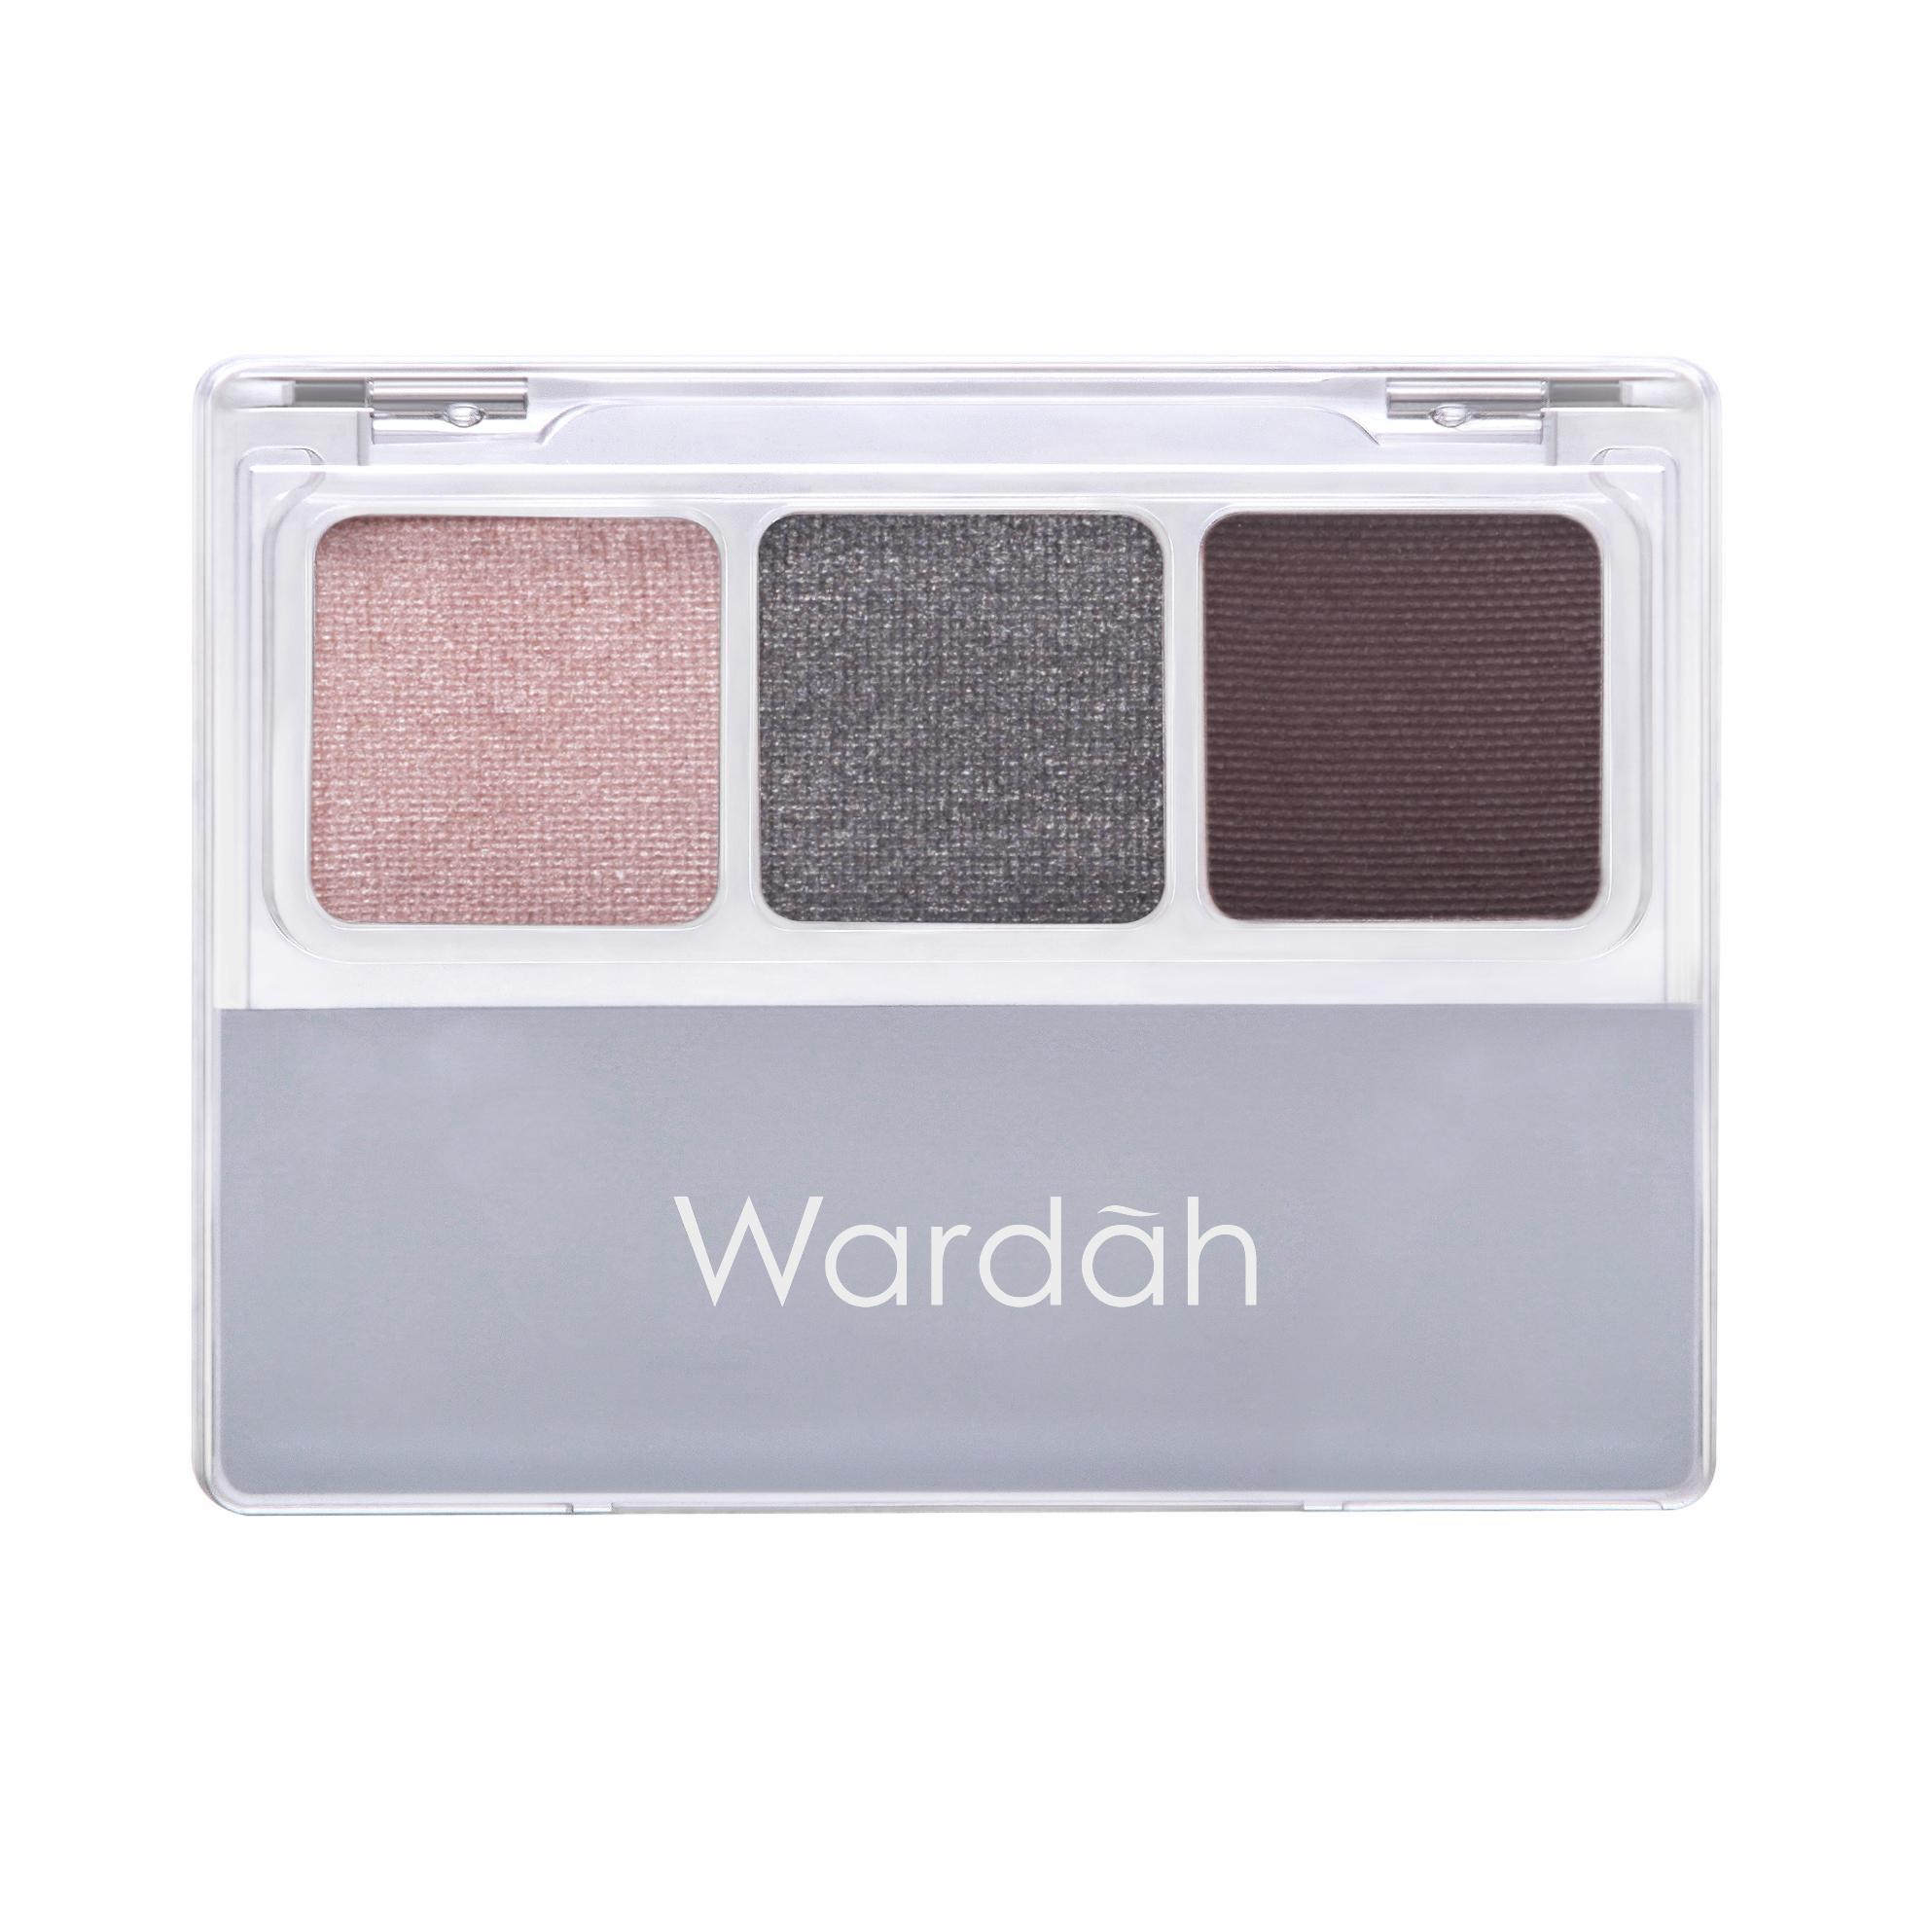 Wardah Nude Colours Eyeshadow Passionate